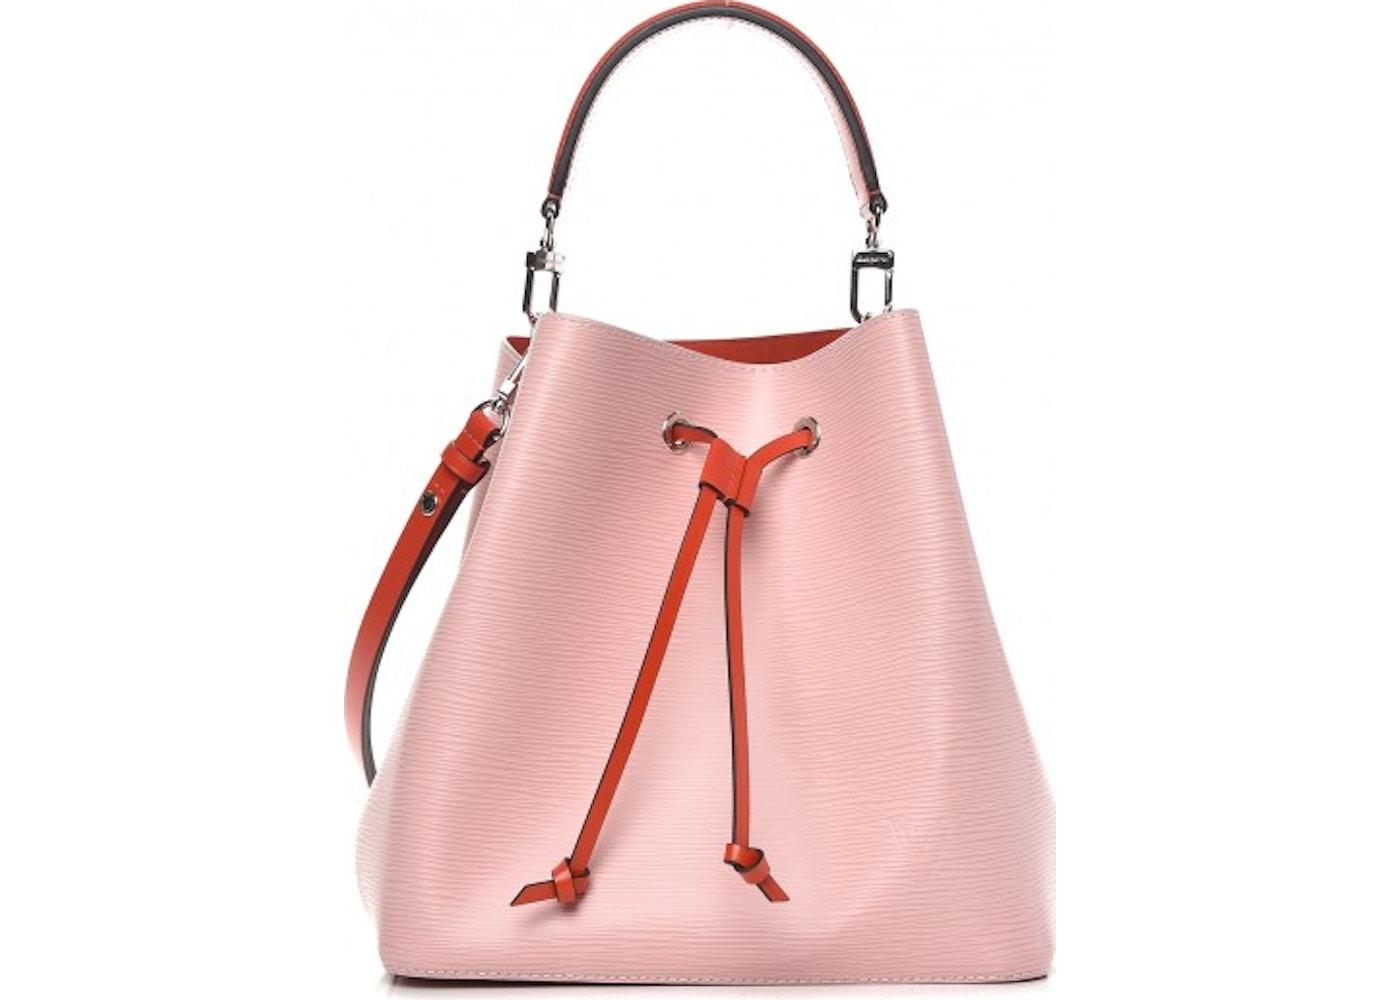 Louis Vuitton Bucket Bag NeoNoe Epi Rose Ballerine Orange. Epi Rose  Ballerine Orange ef3b53cb9